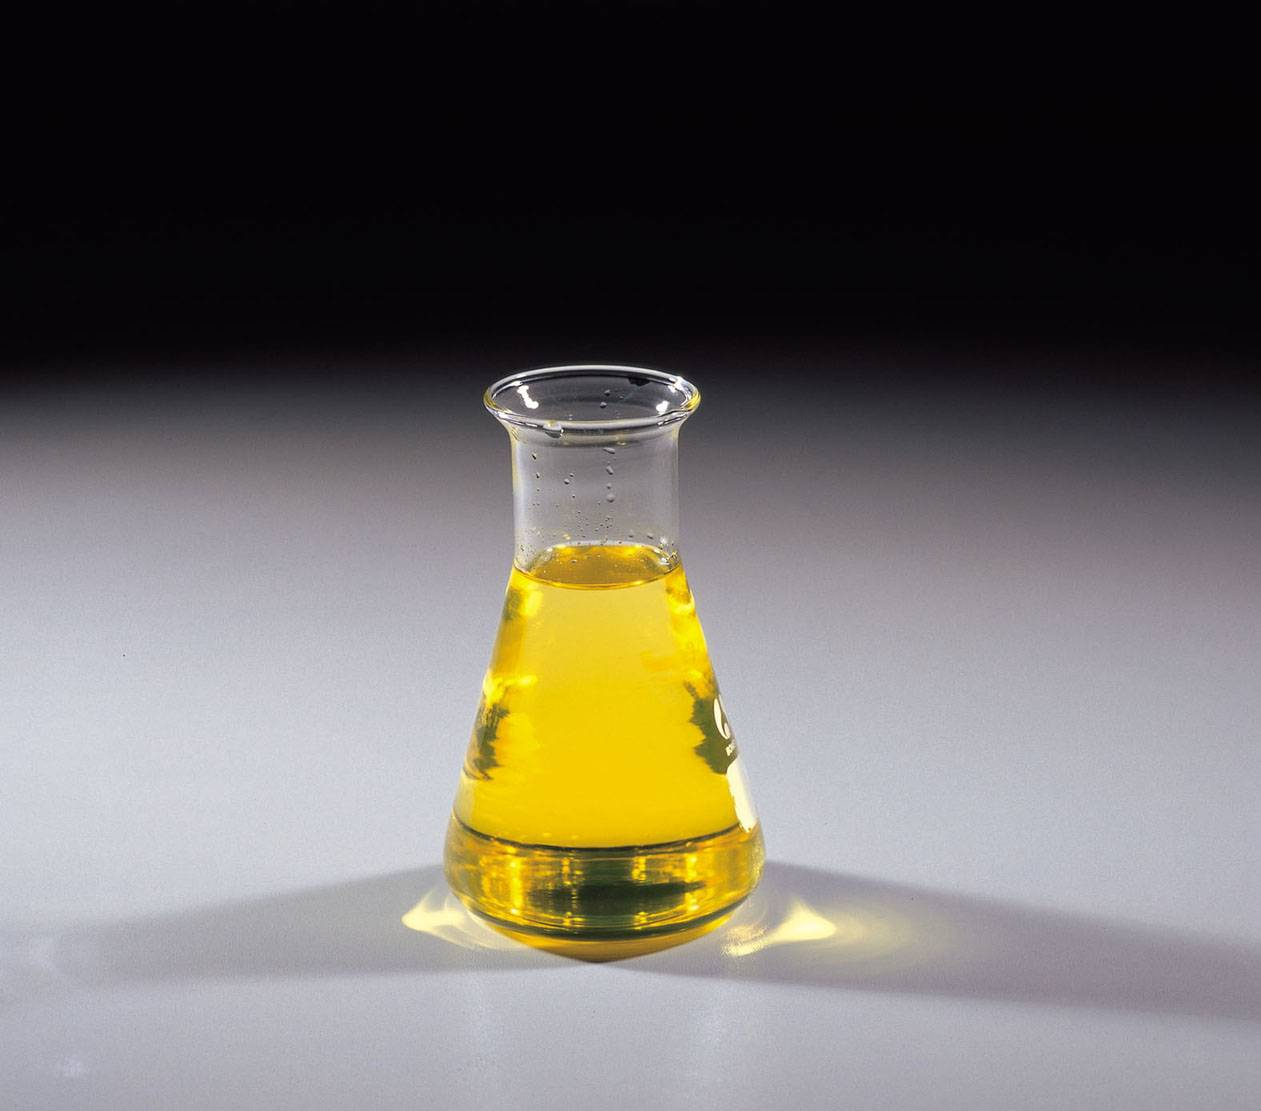 Polyoxyethylene (20)Sorbitan Monooleate